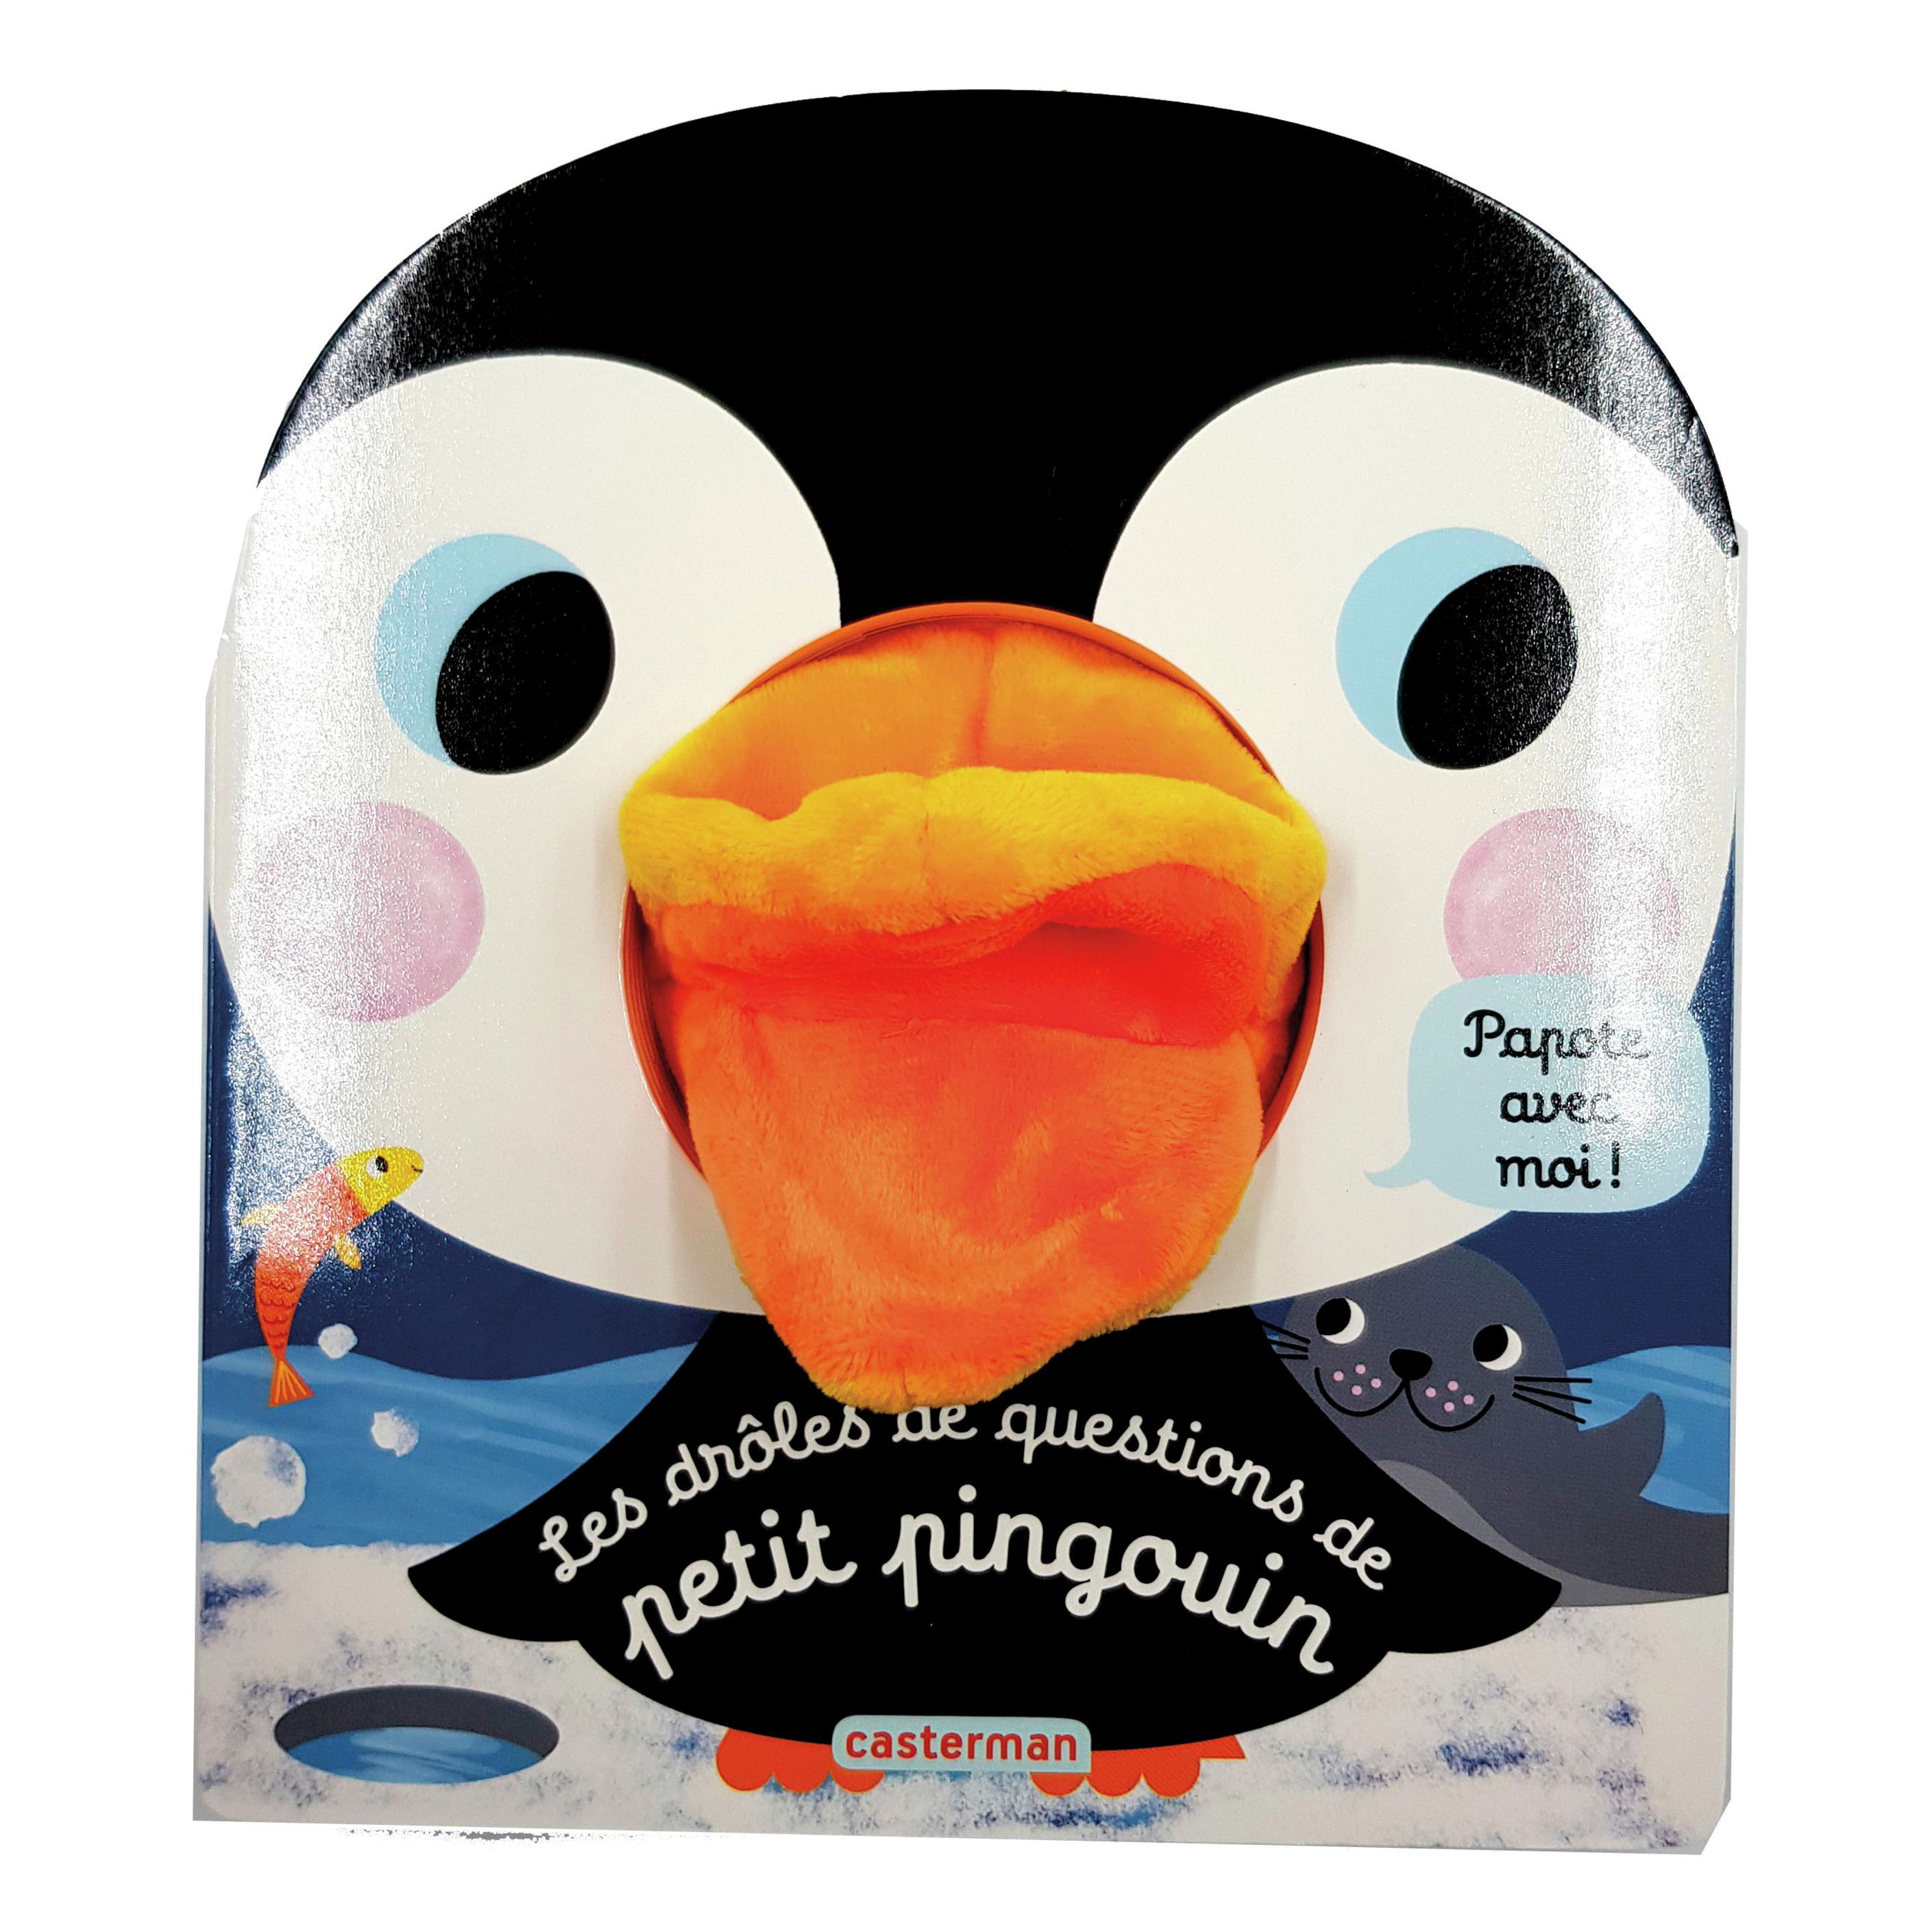 LES DROLES DE QUESTIONS DE PETIT PINGOUIN